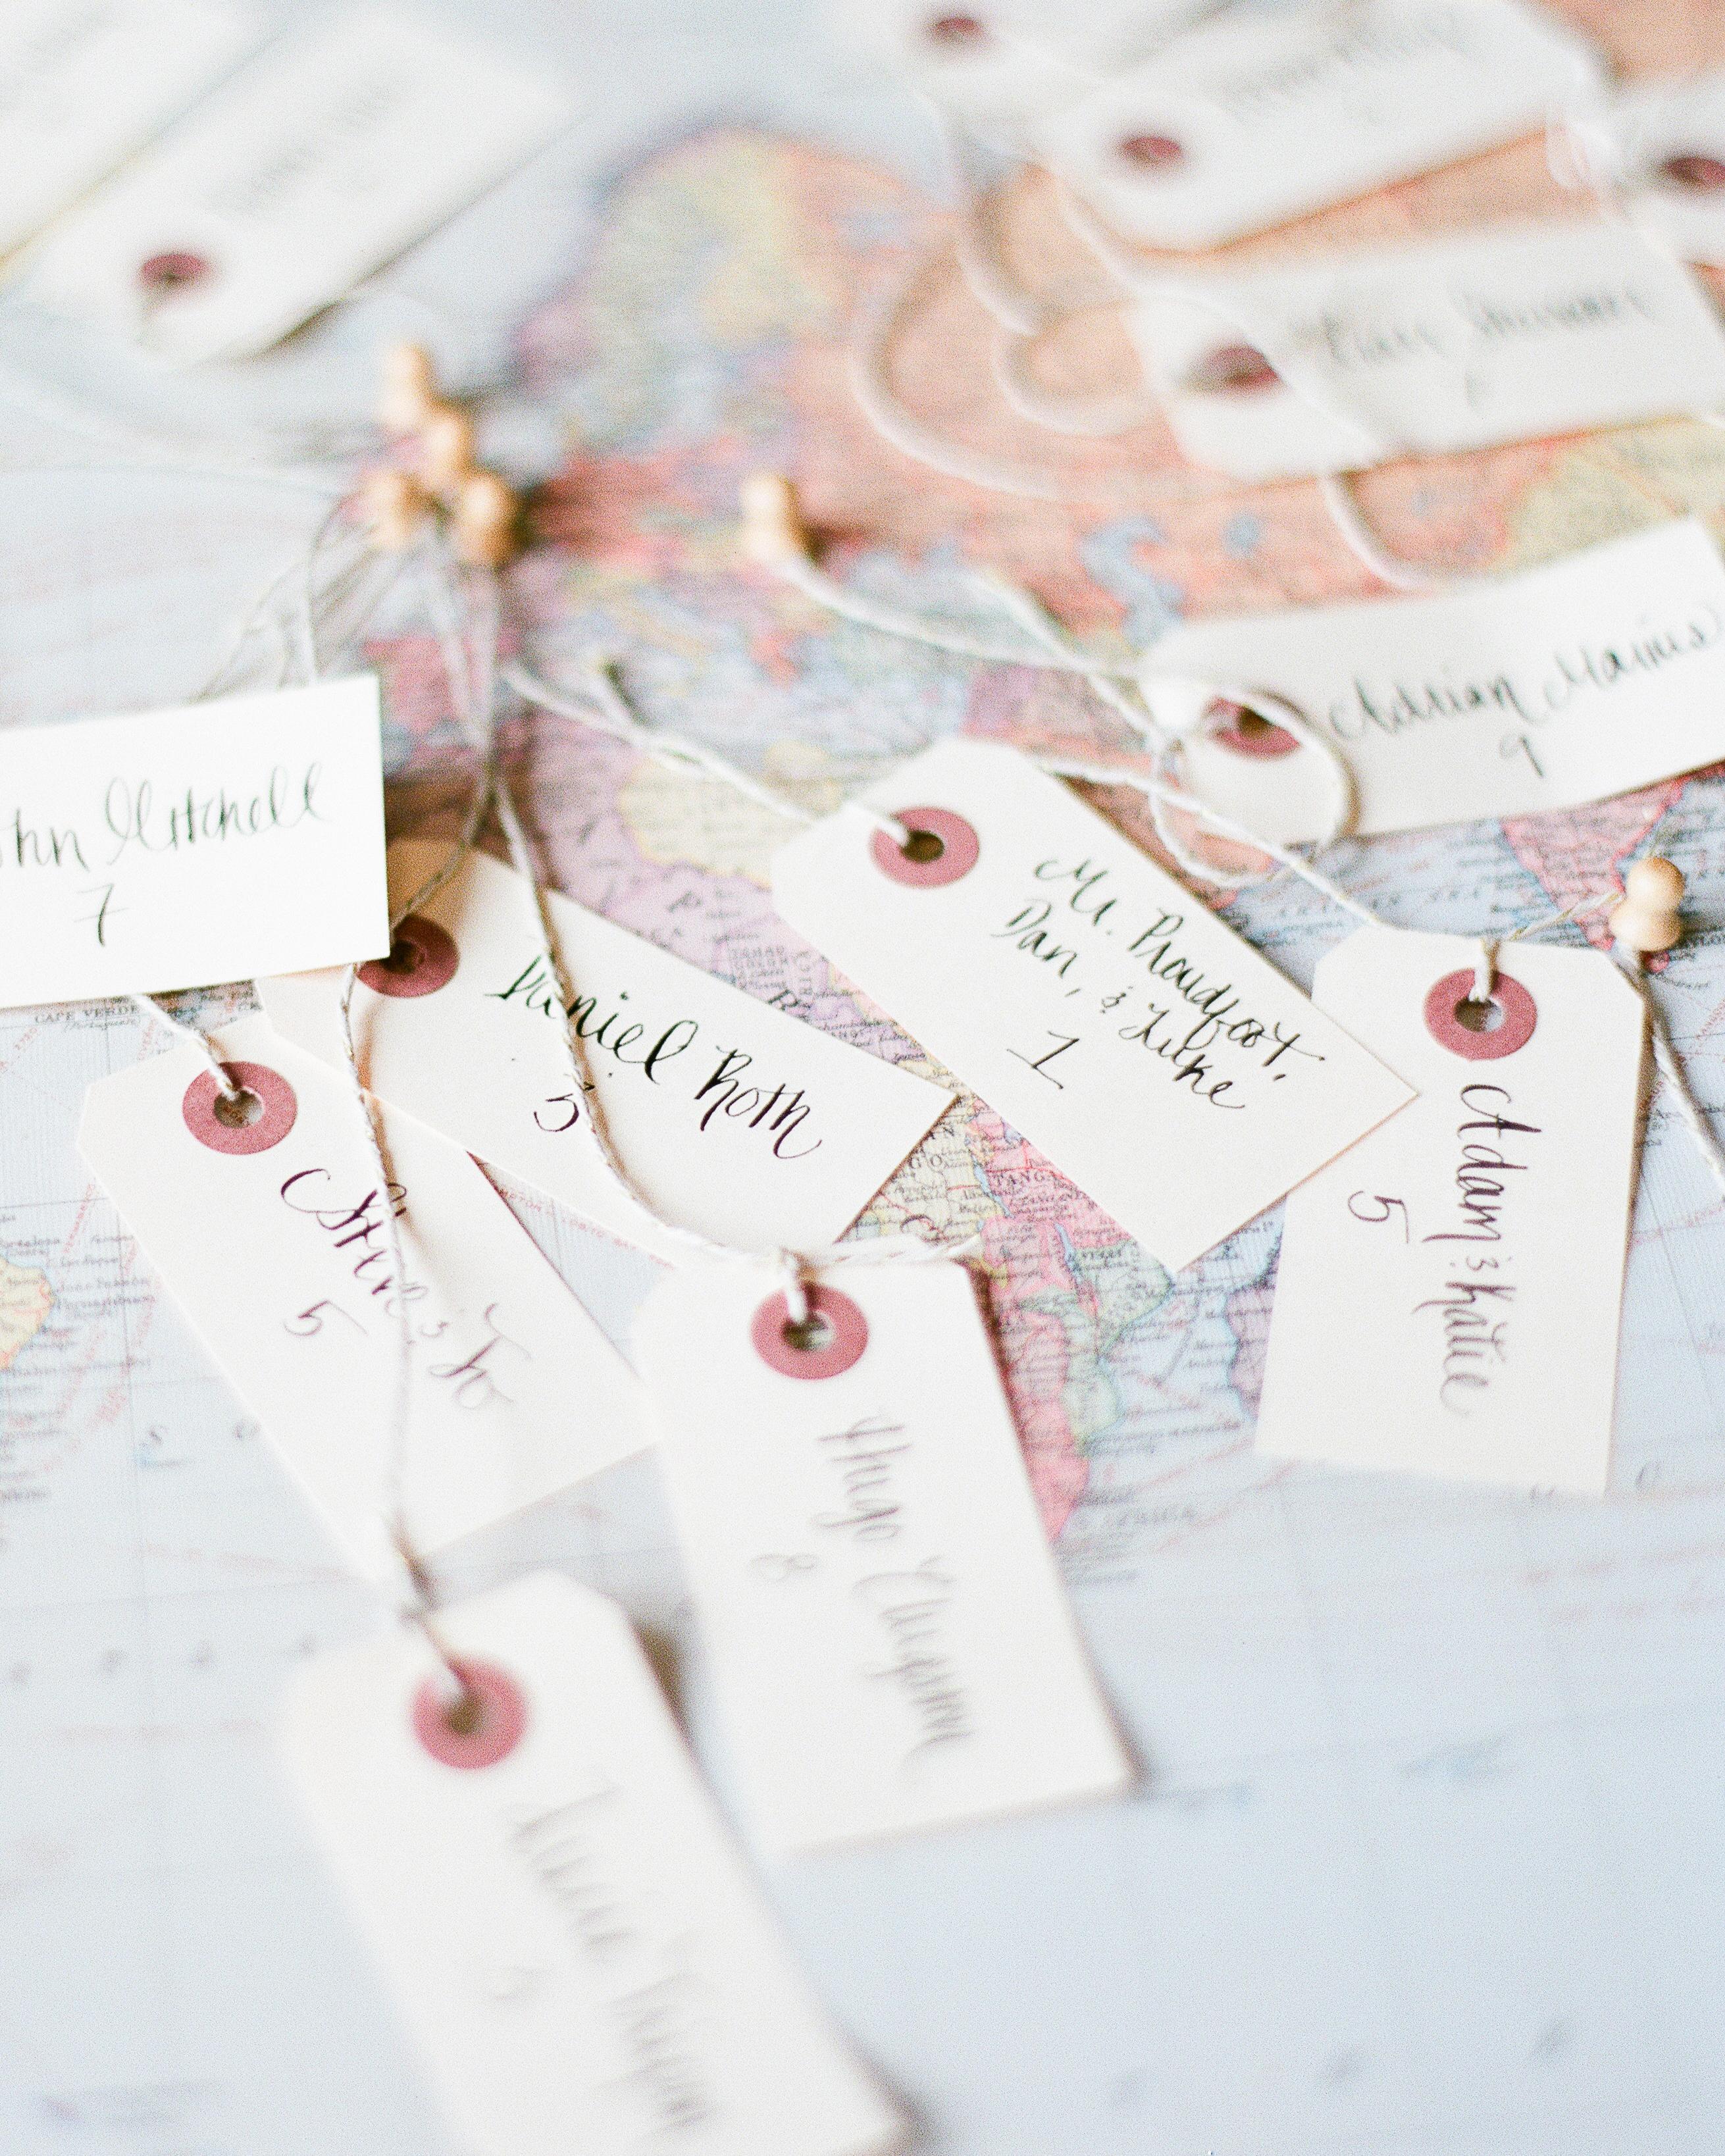 ashley-jonathon-wedding-escortcards-48-s111483-0914.jpg